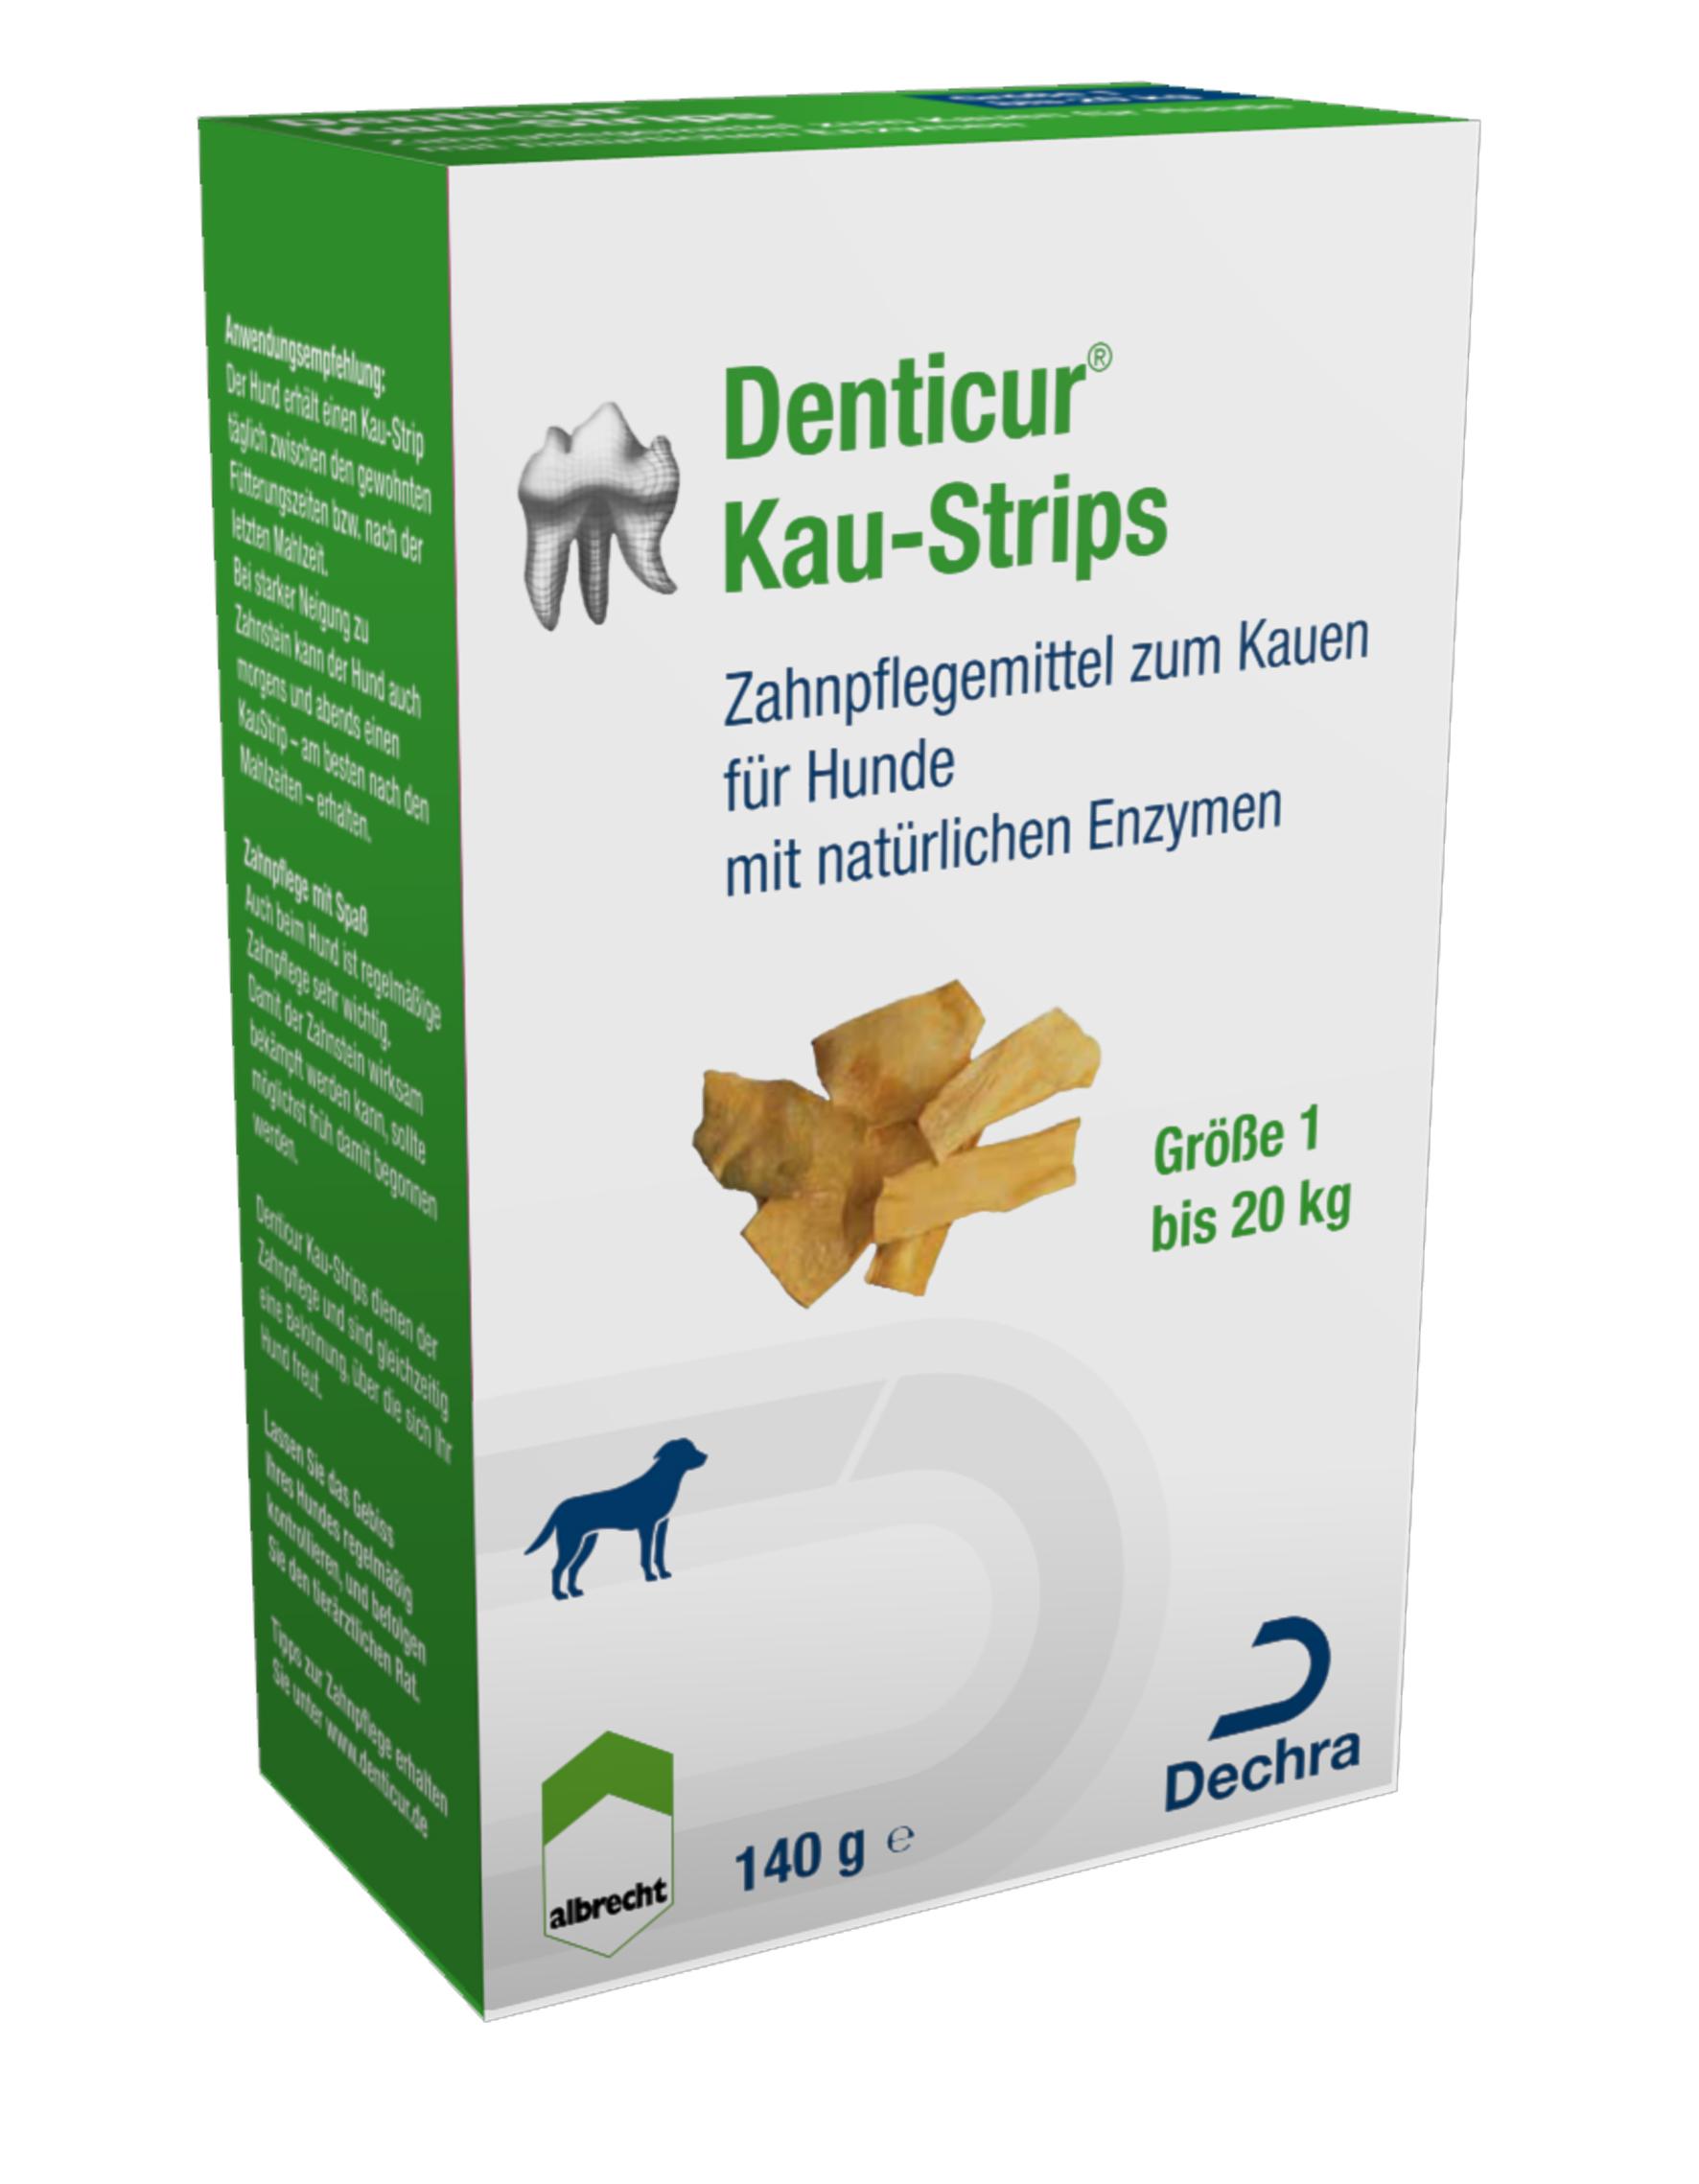 Albrecht Denticur Kau-Strips Nr. 1 140g - Gr. 1 für Hunde bis 20 kg